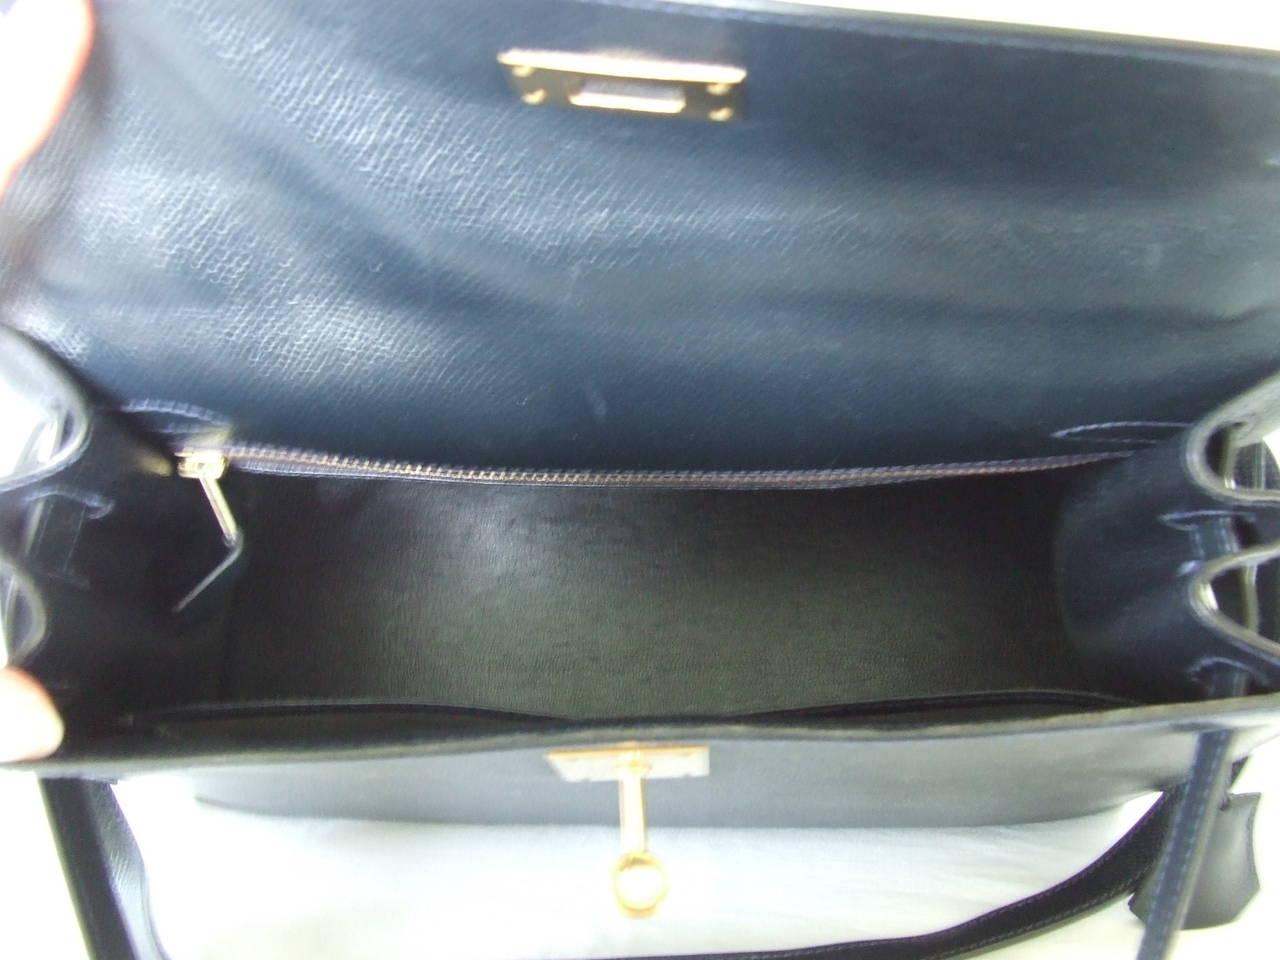 Authentic Hermes Kelly 28 Sellier Bag Epsom Bleu Gold Hardware For Sale 2 a04552925e